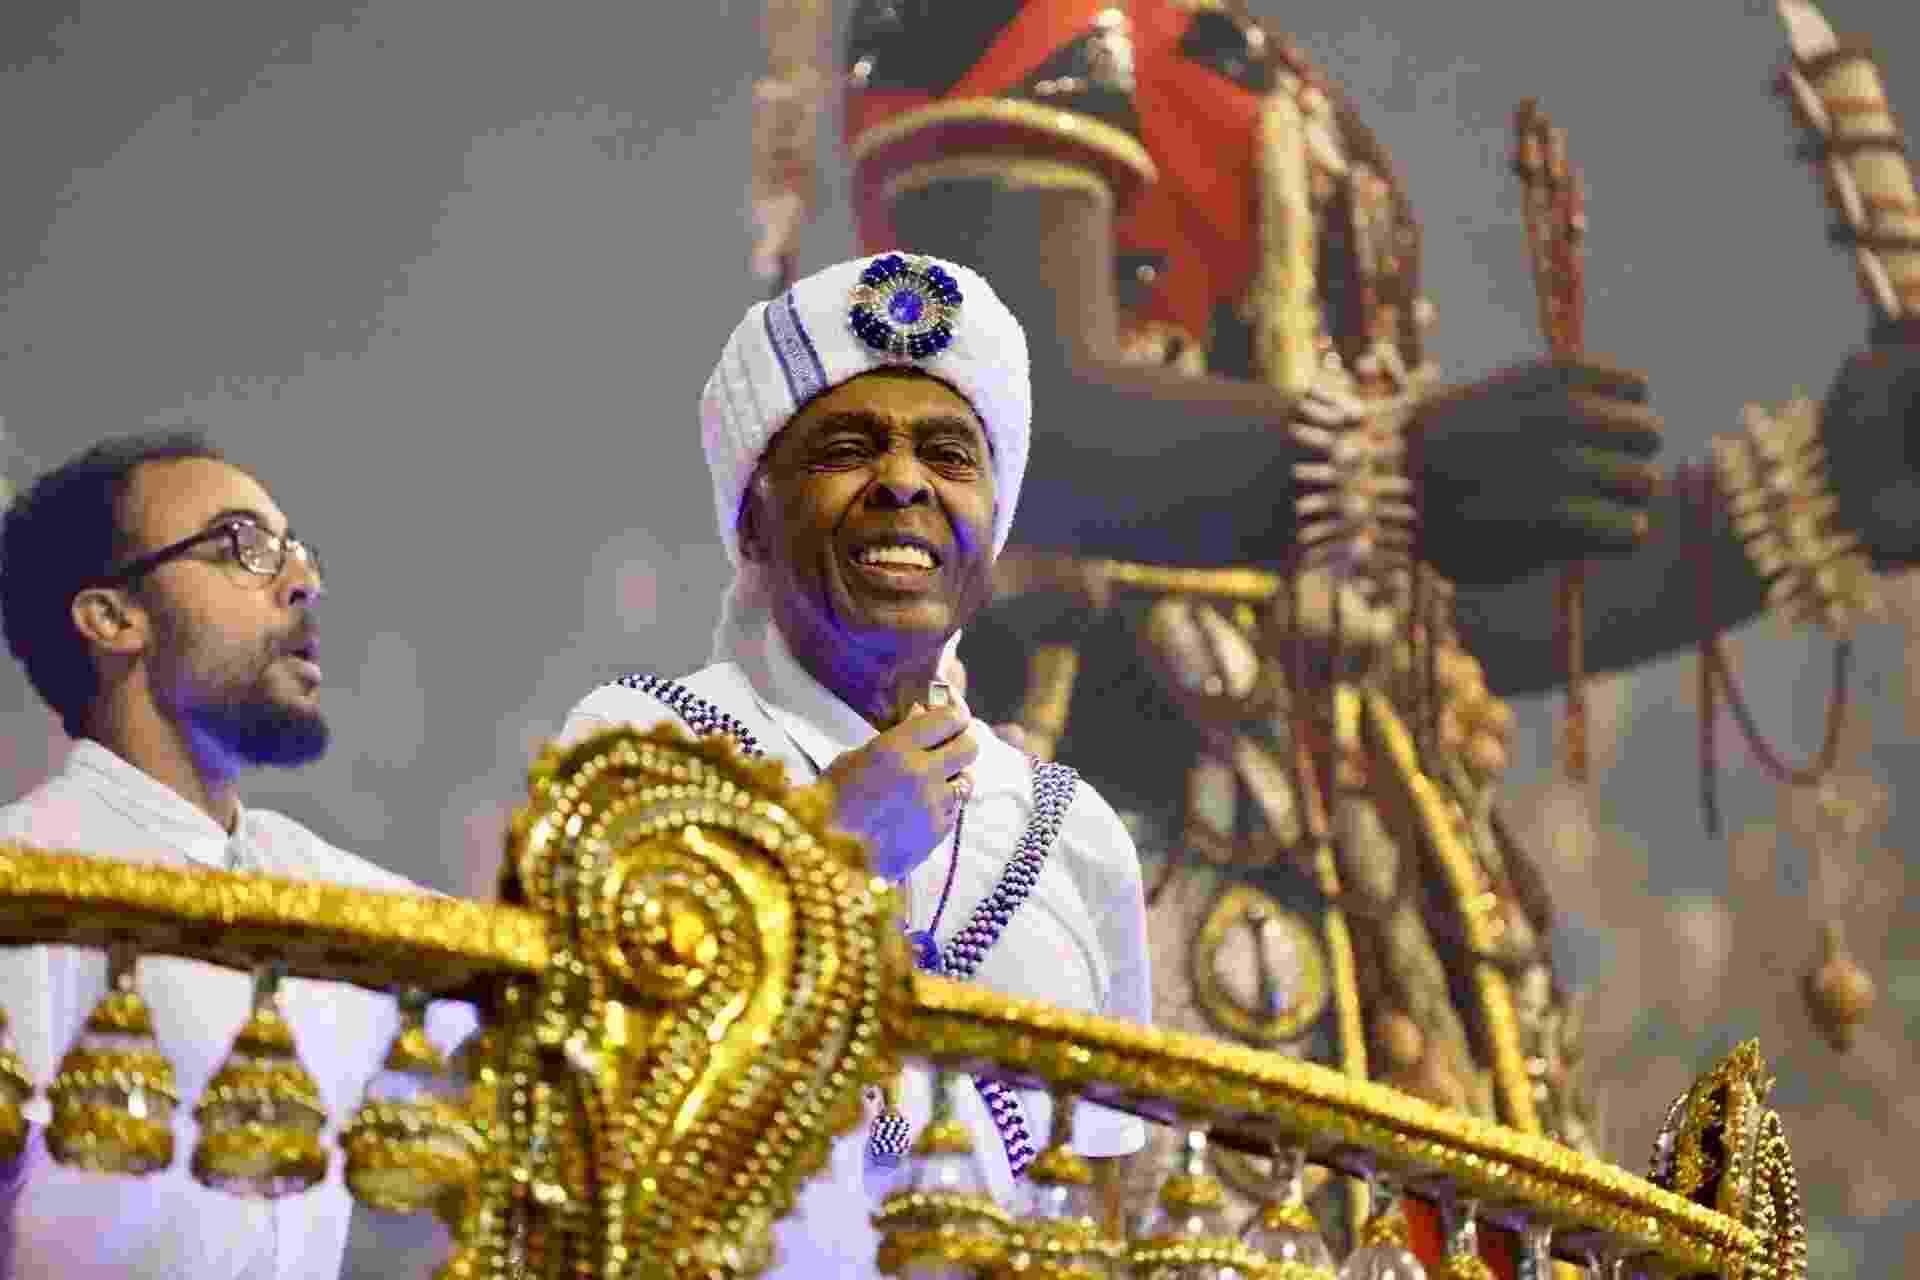 Gilberto Gil é homenageado pela Vai-Vai em desfile - Simon Plestenjak/UOL